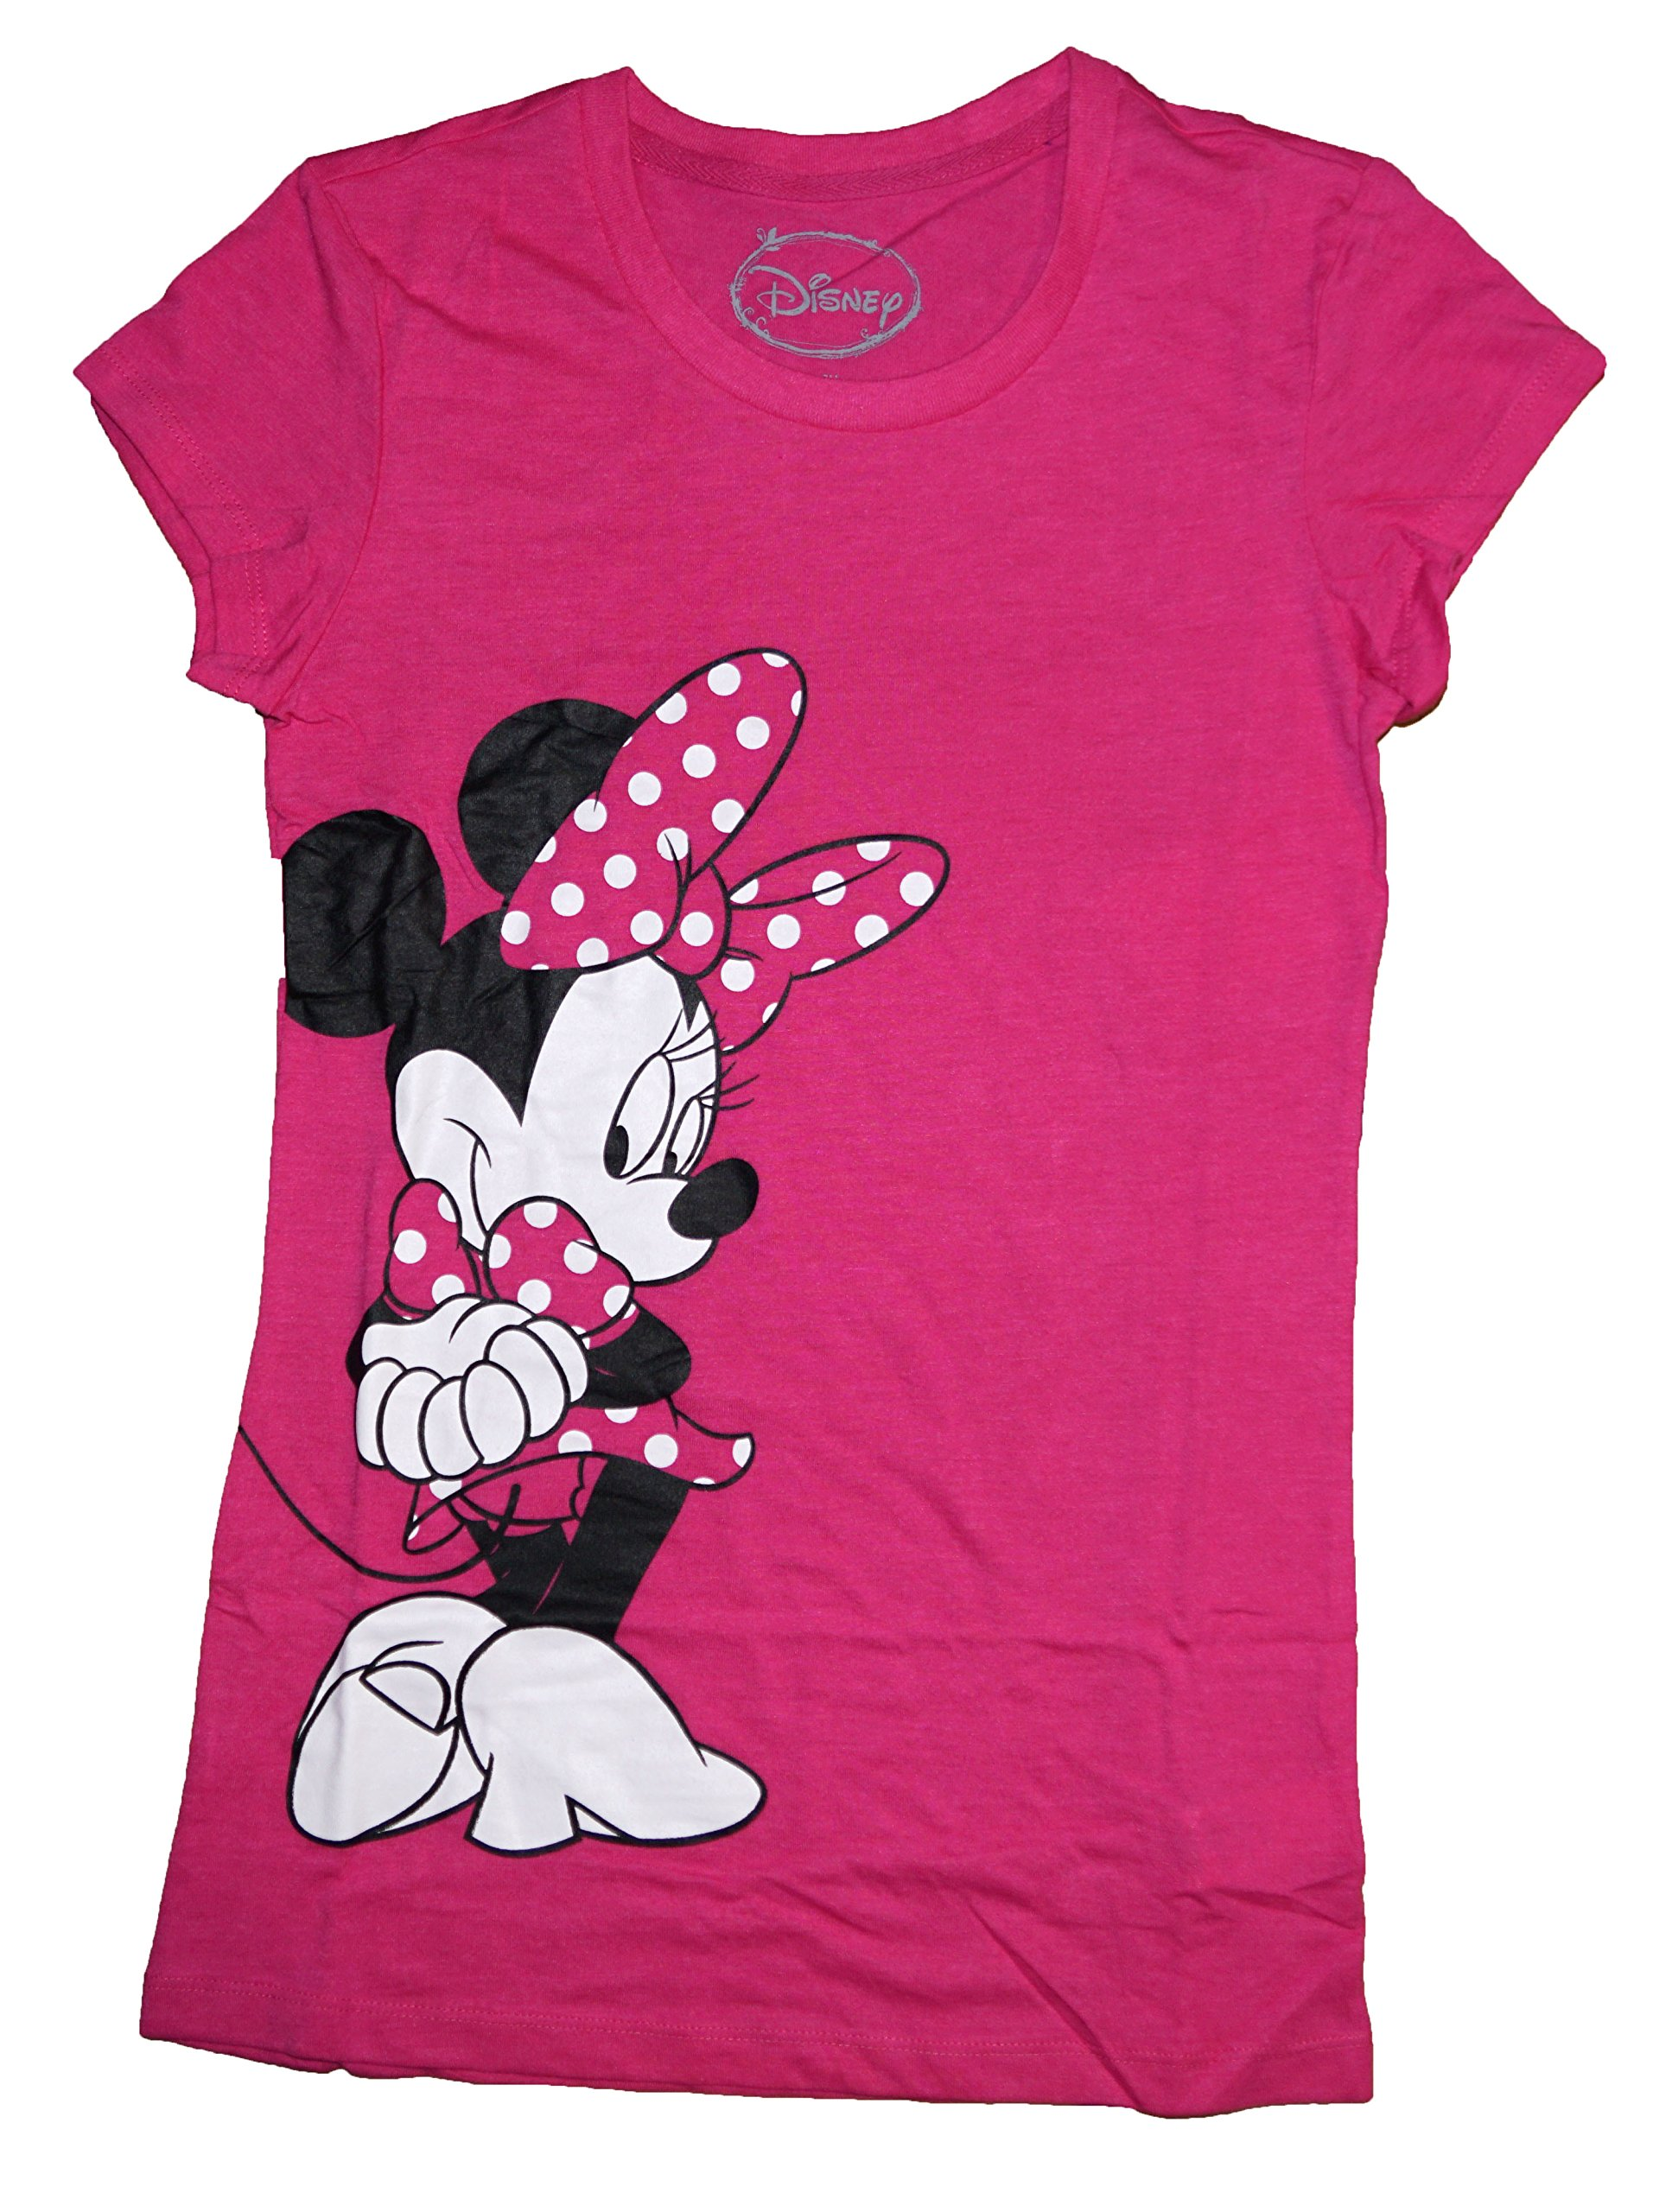 Disney Classic Minnie Mouse Womens Pajama T Shirt Top - Pink